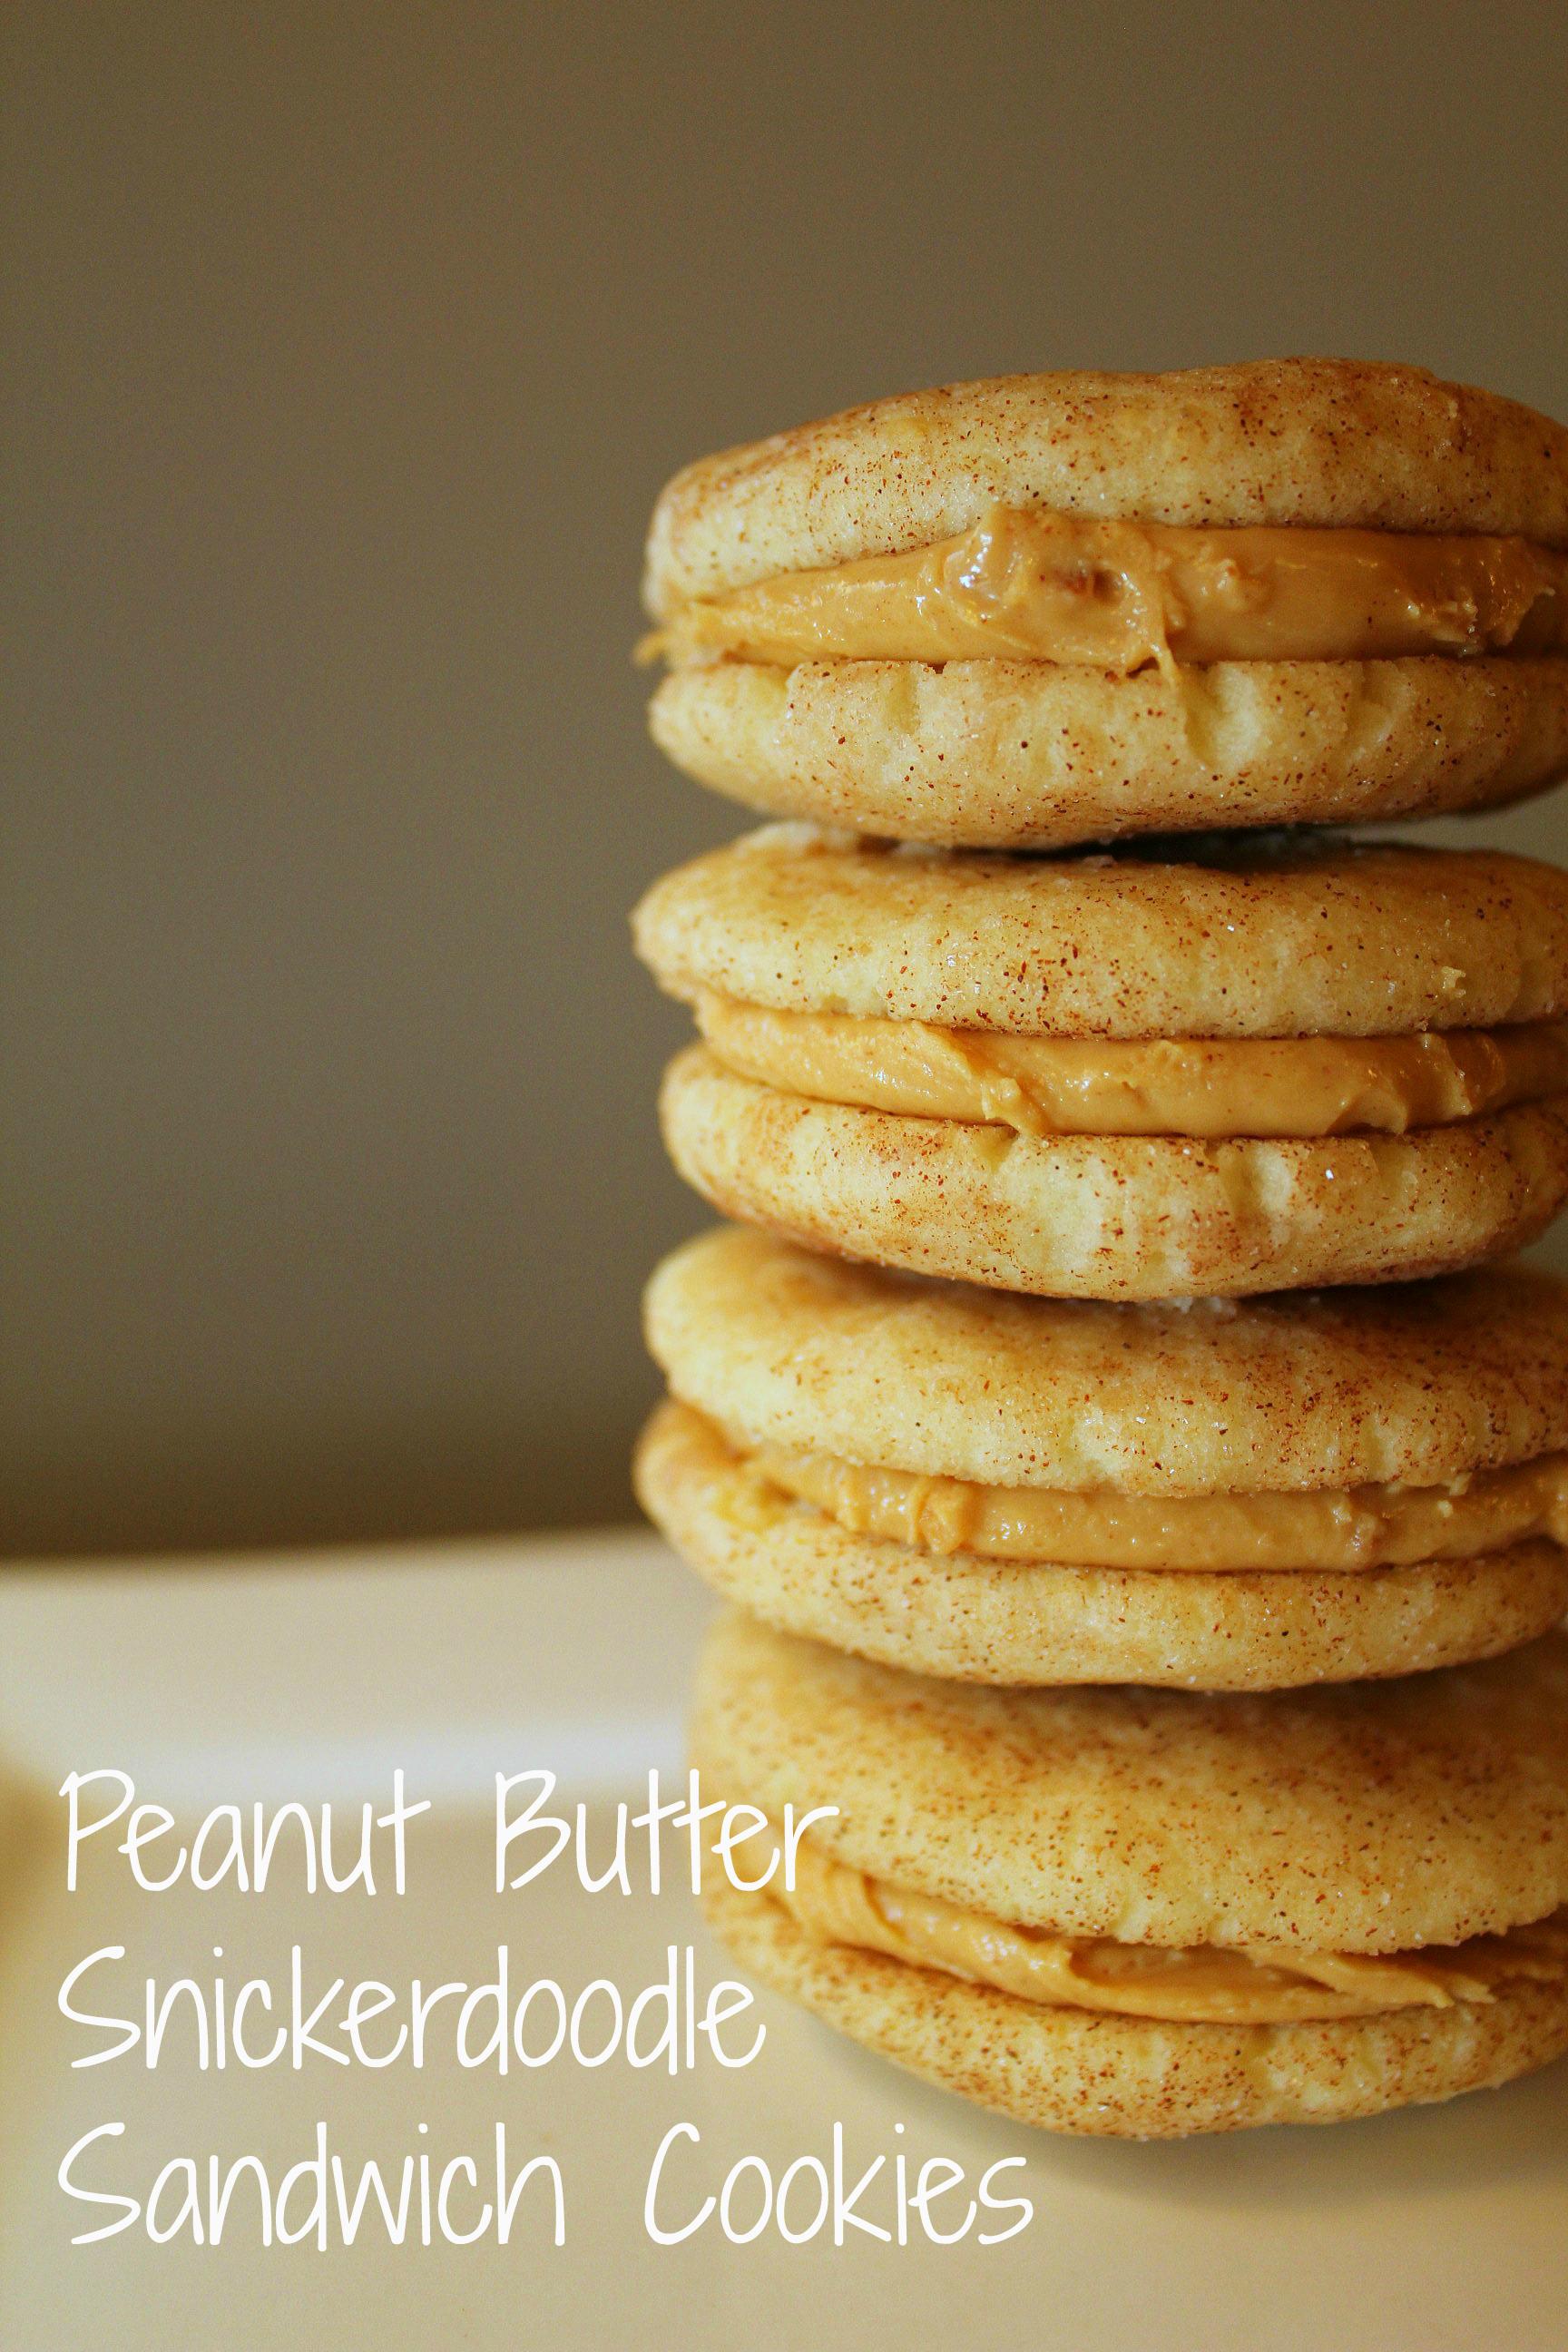 peanut butter snickerdoodle sandwich cookies